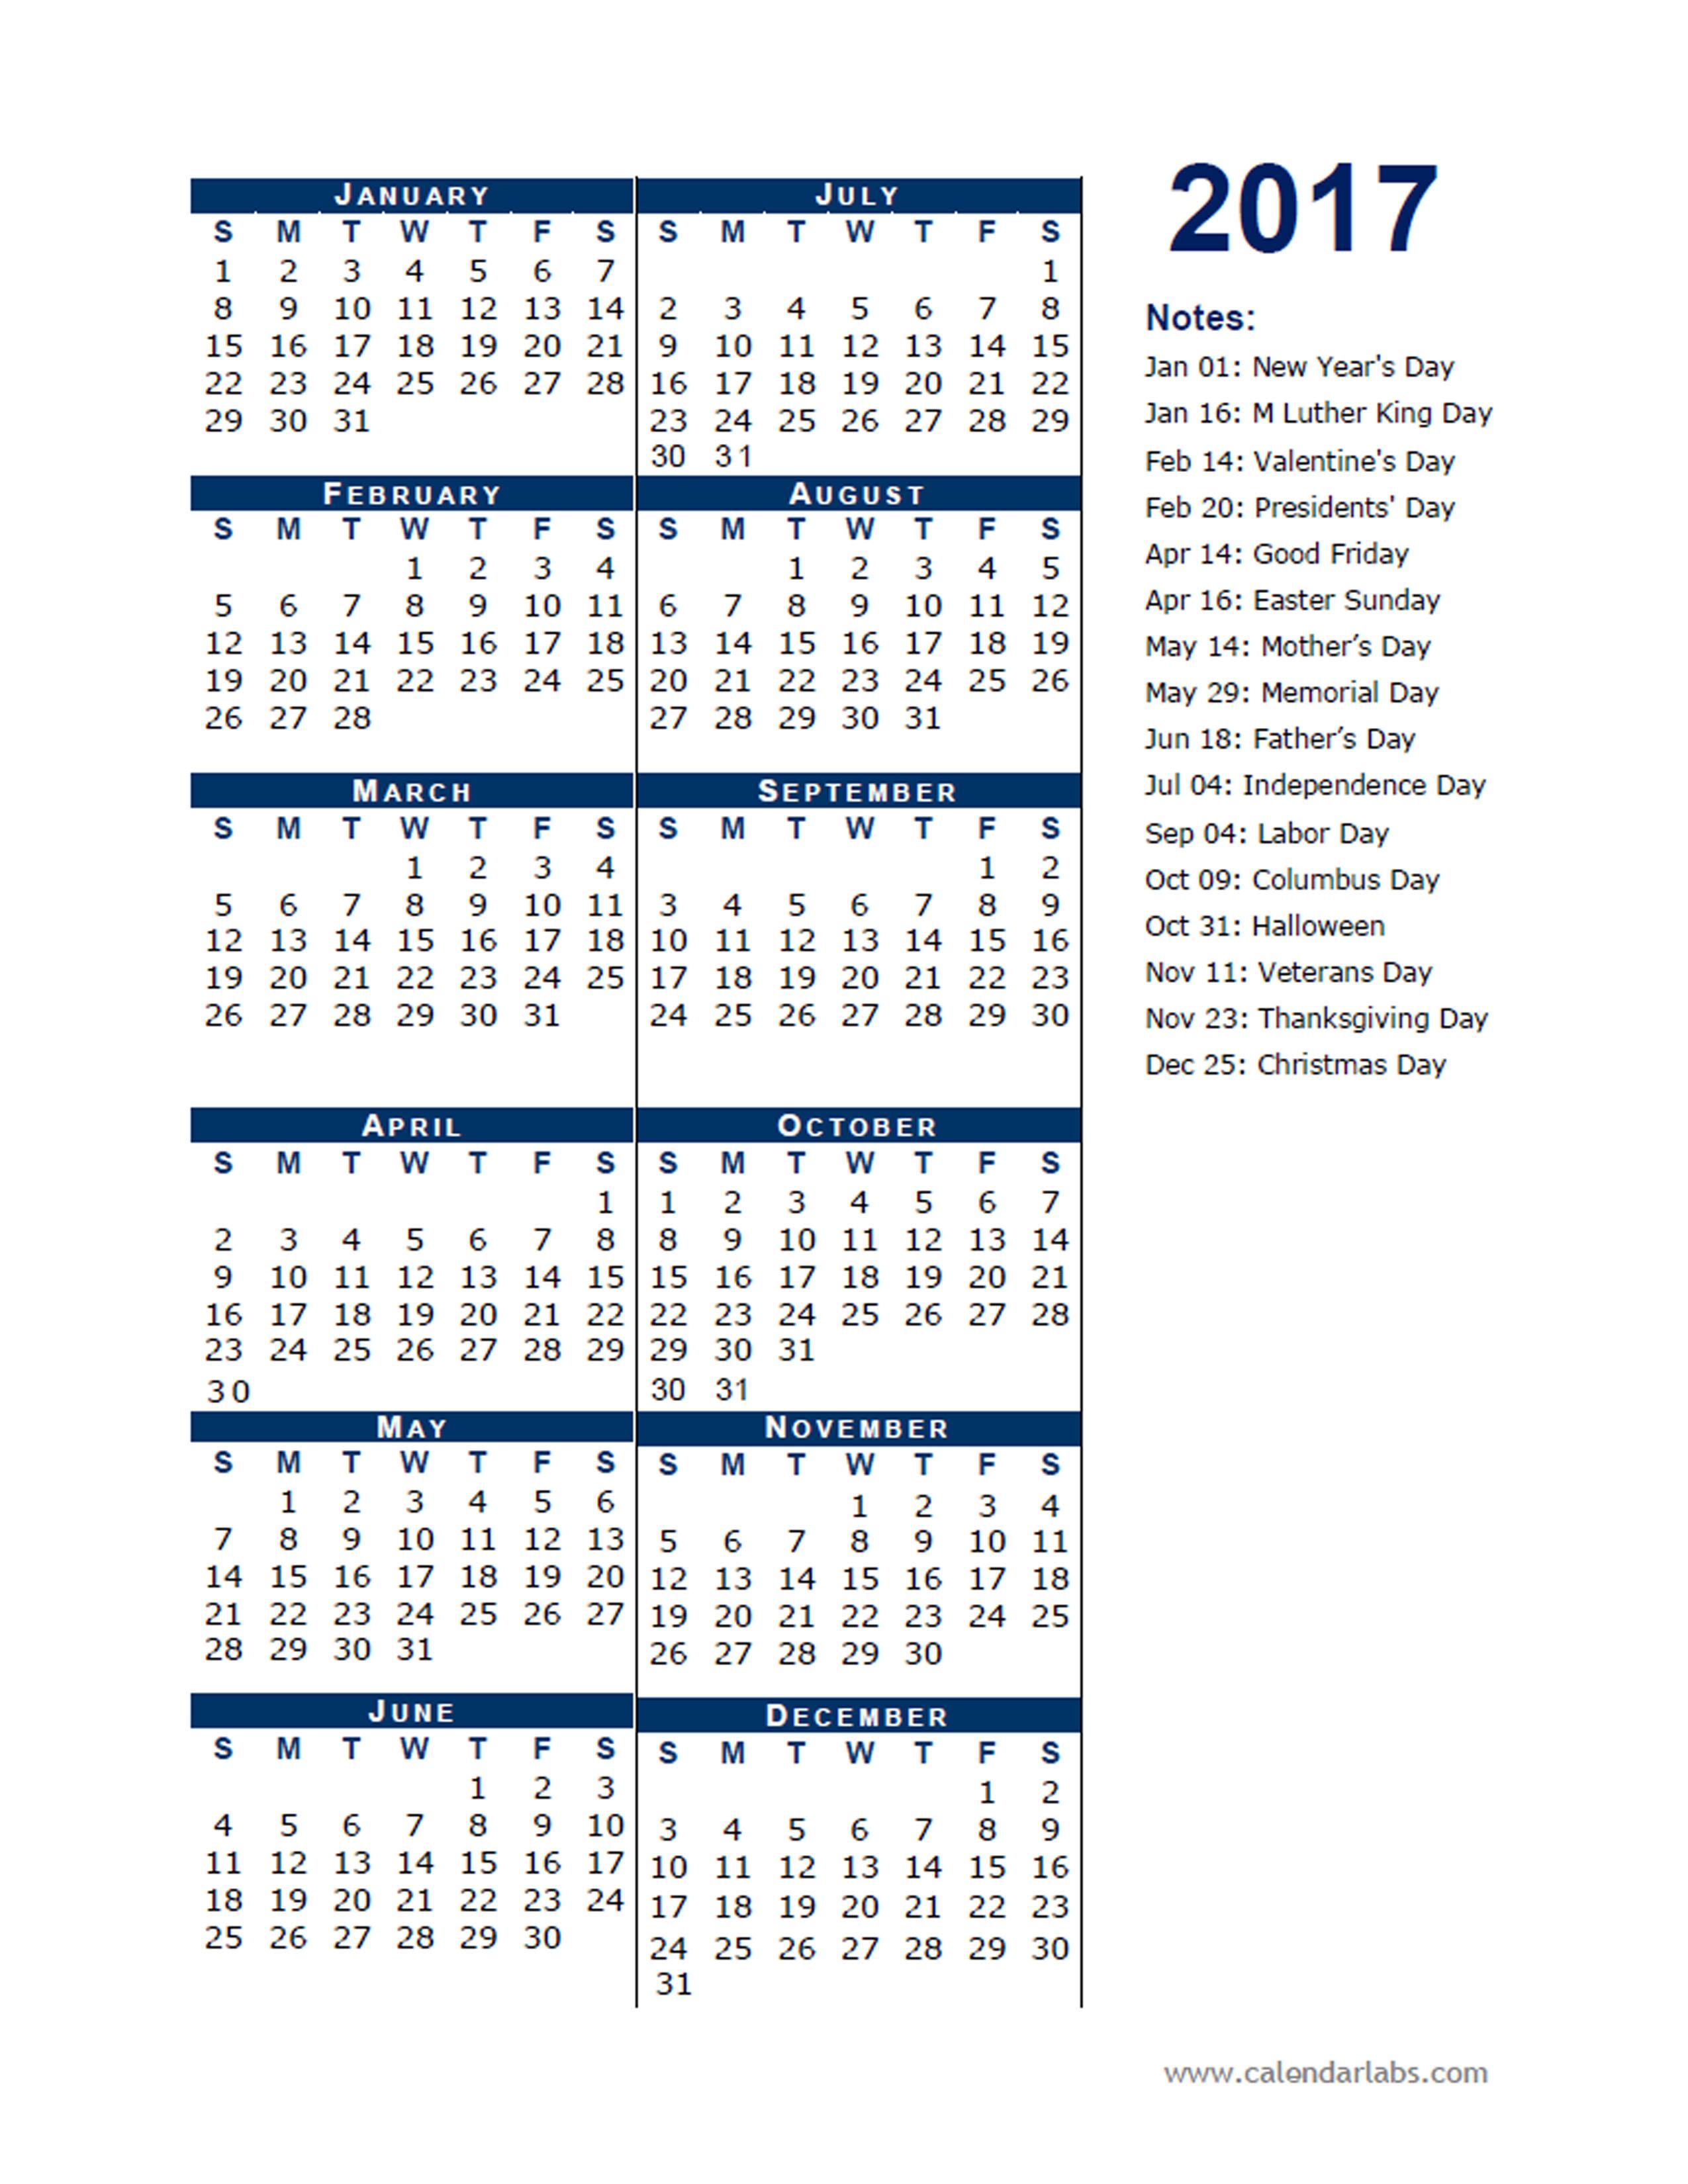 2017 Calendar Template Half Page - Free Printable Templates